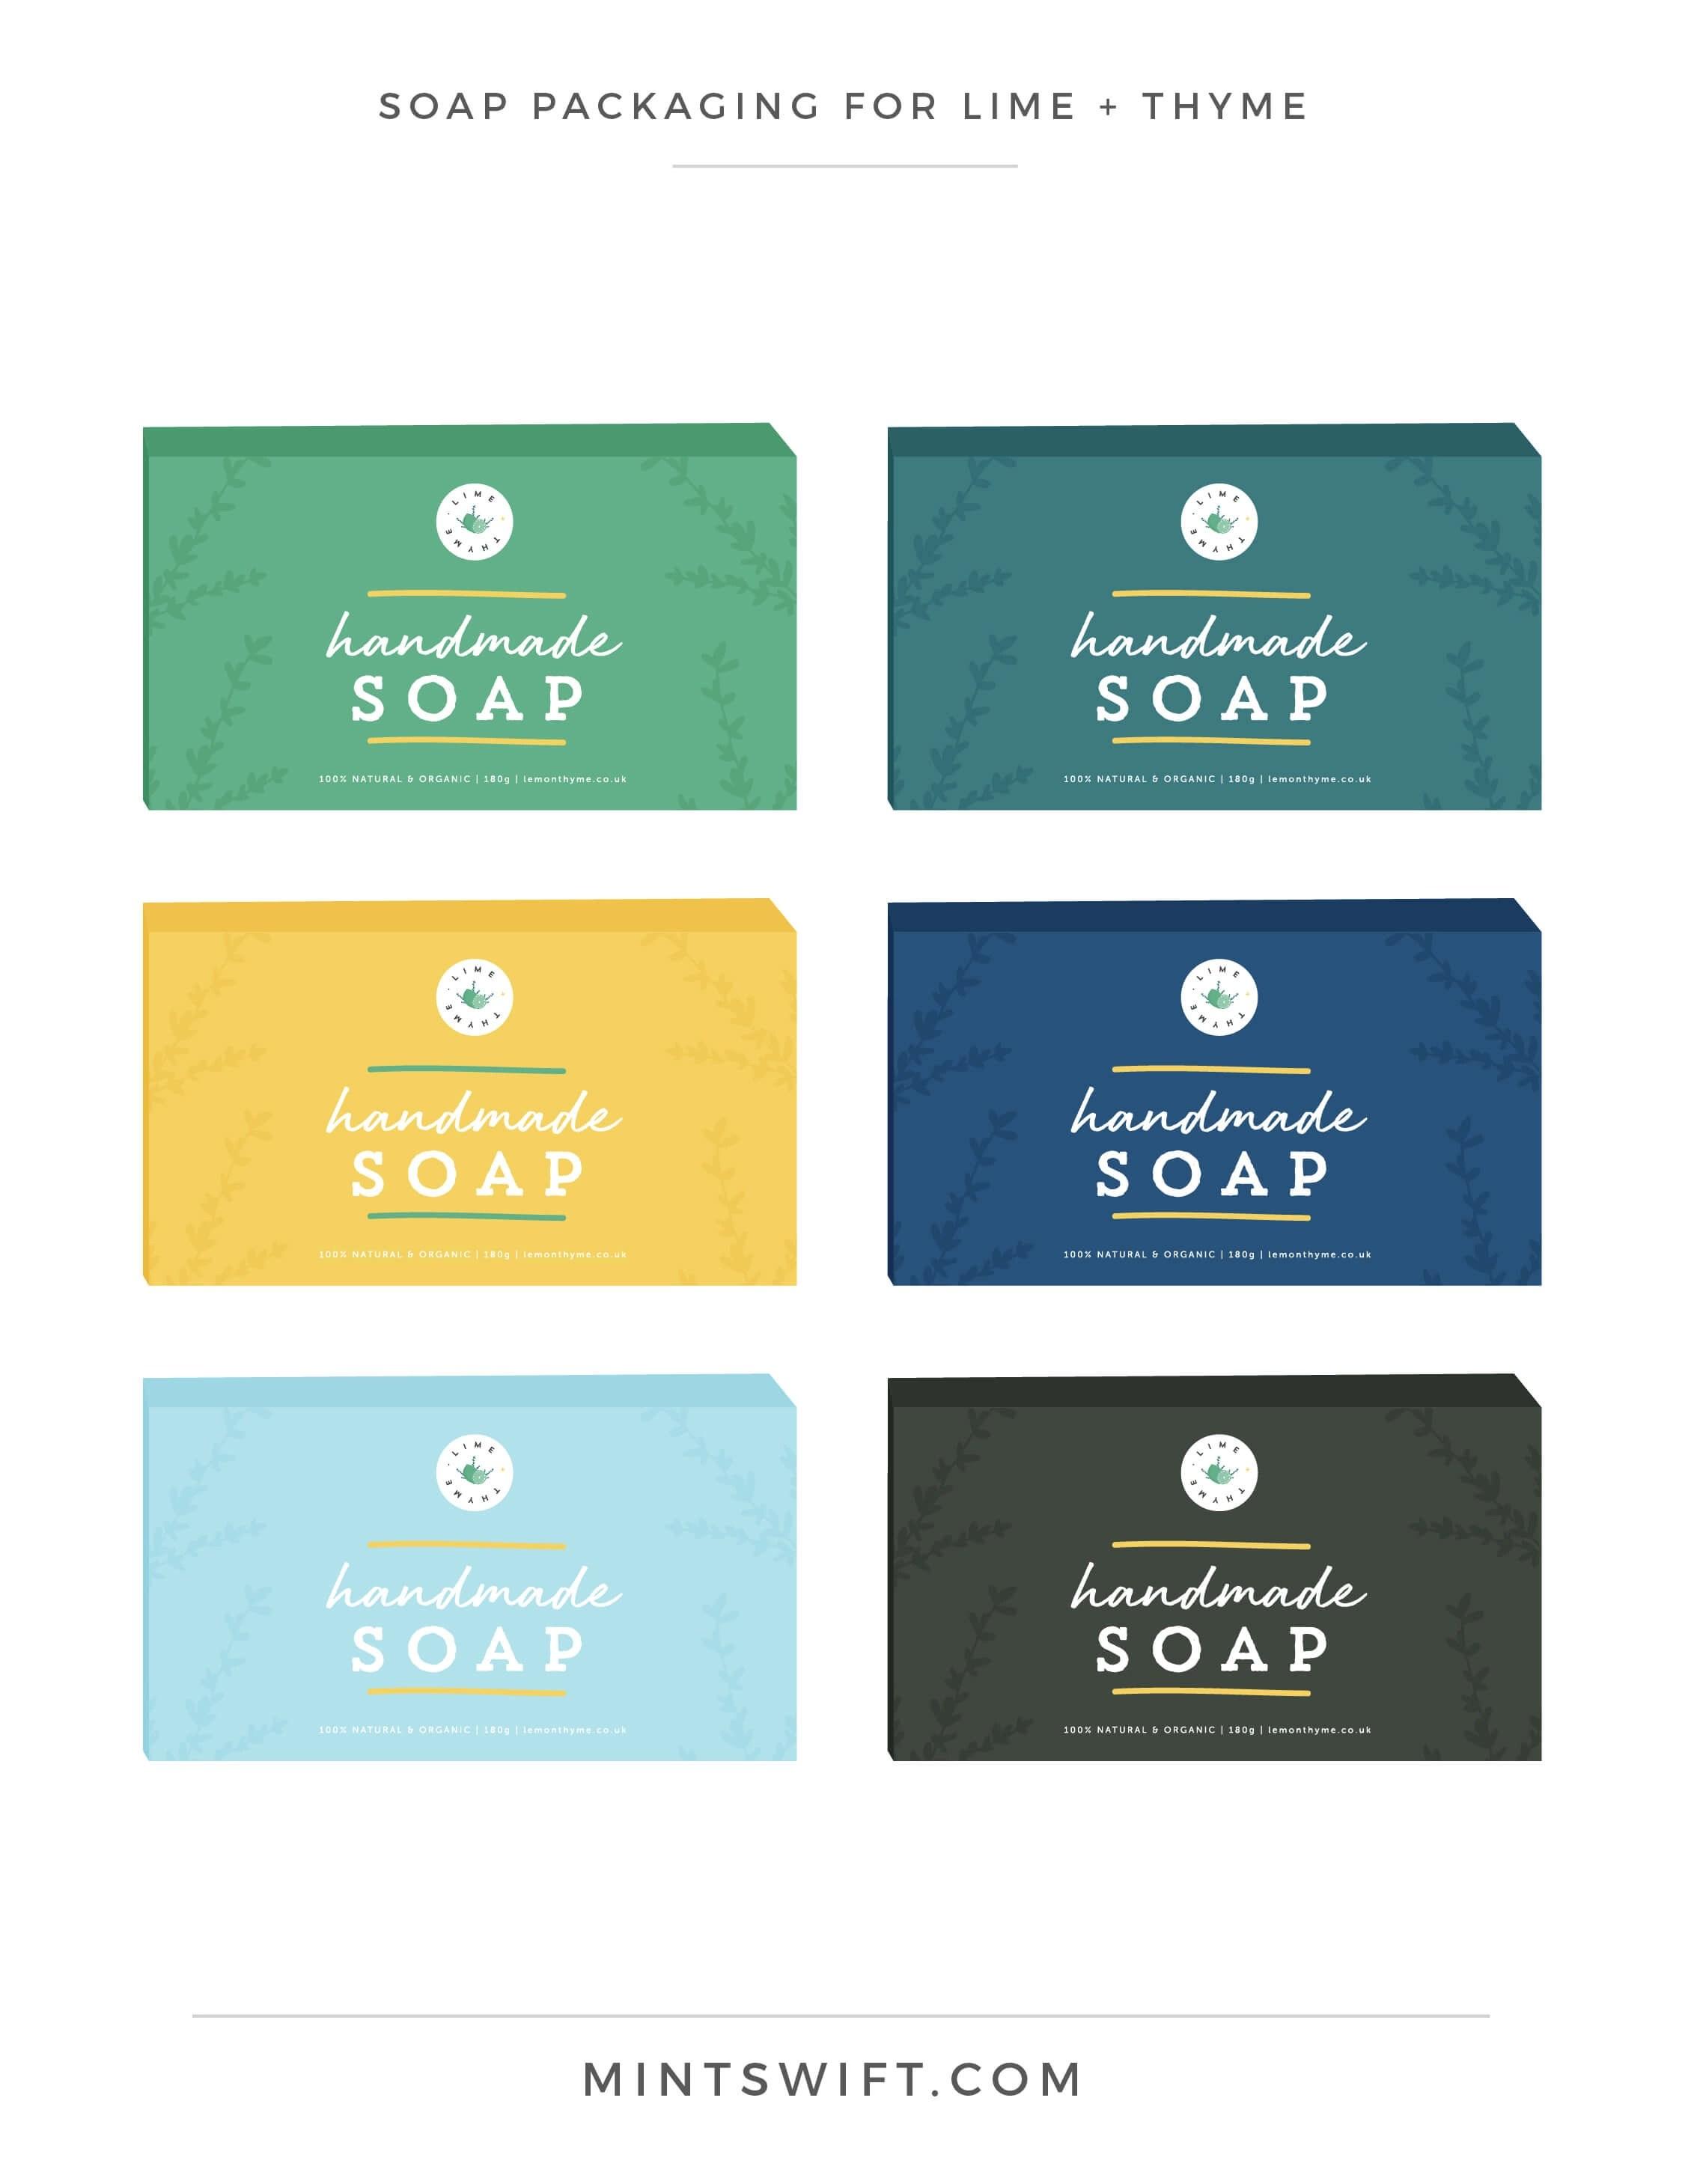 Lime + Thyme - Soap Packaging - Brand & Website Design - MintSwift